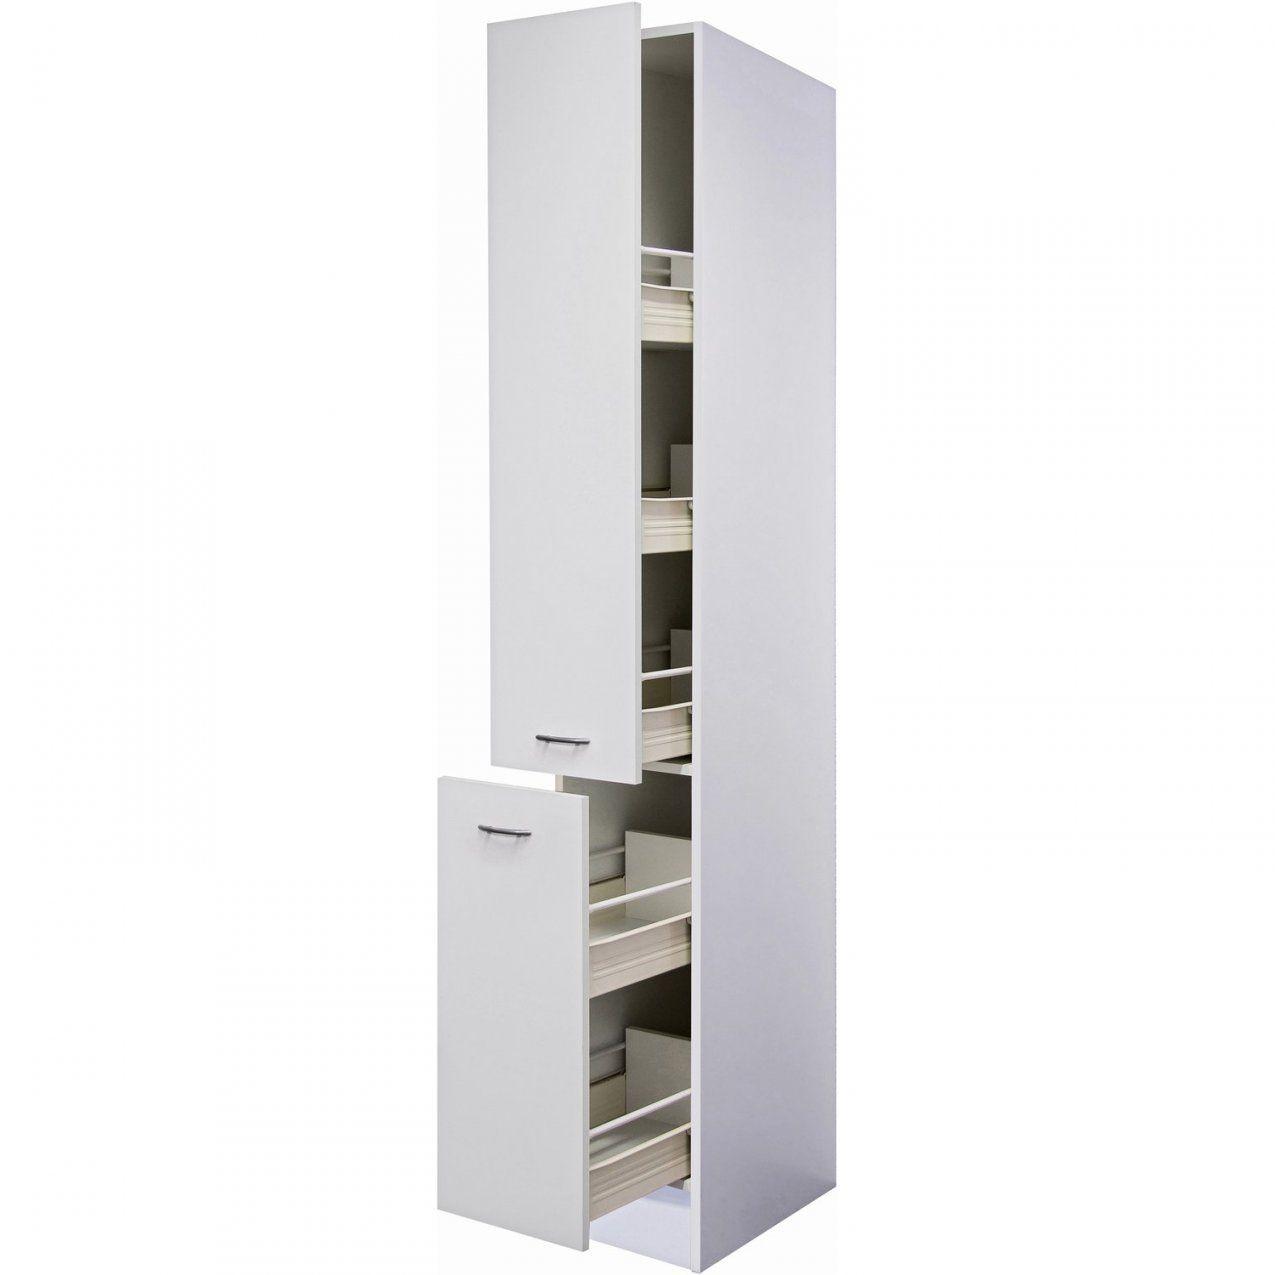 Ikea Schrank 50 Cm Breit | Ikea Ivar Regal Gebraucht ...